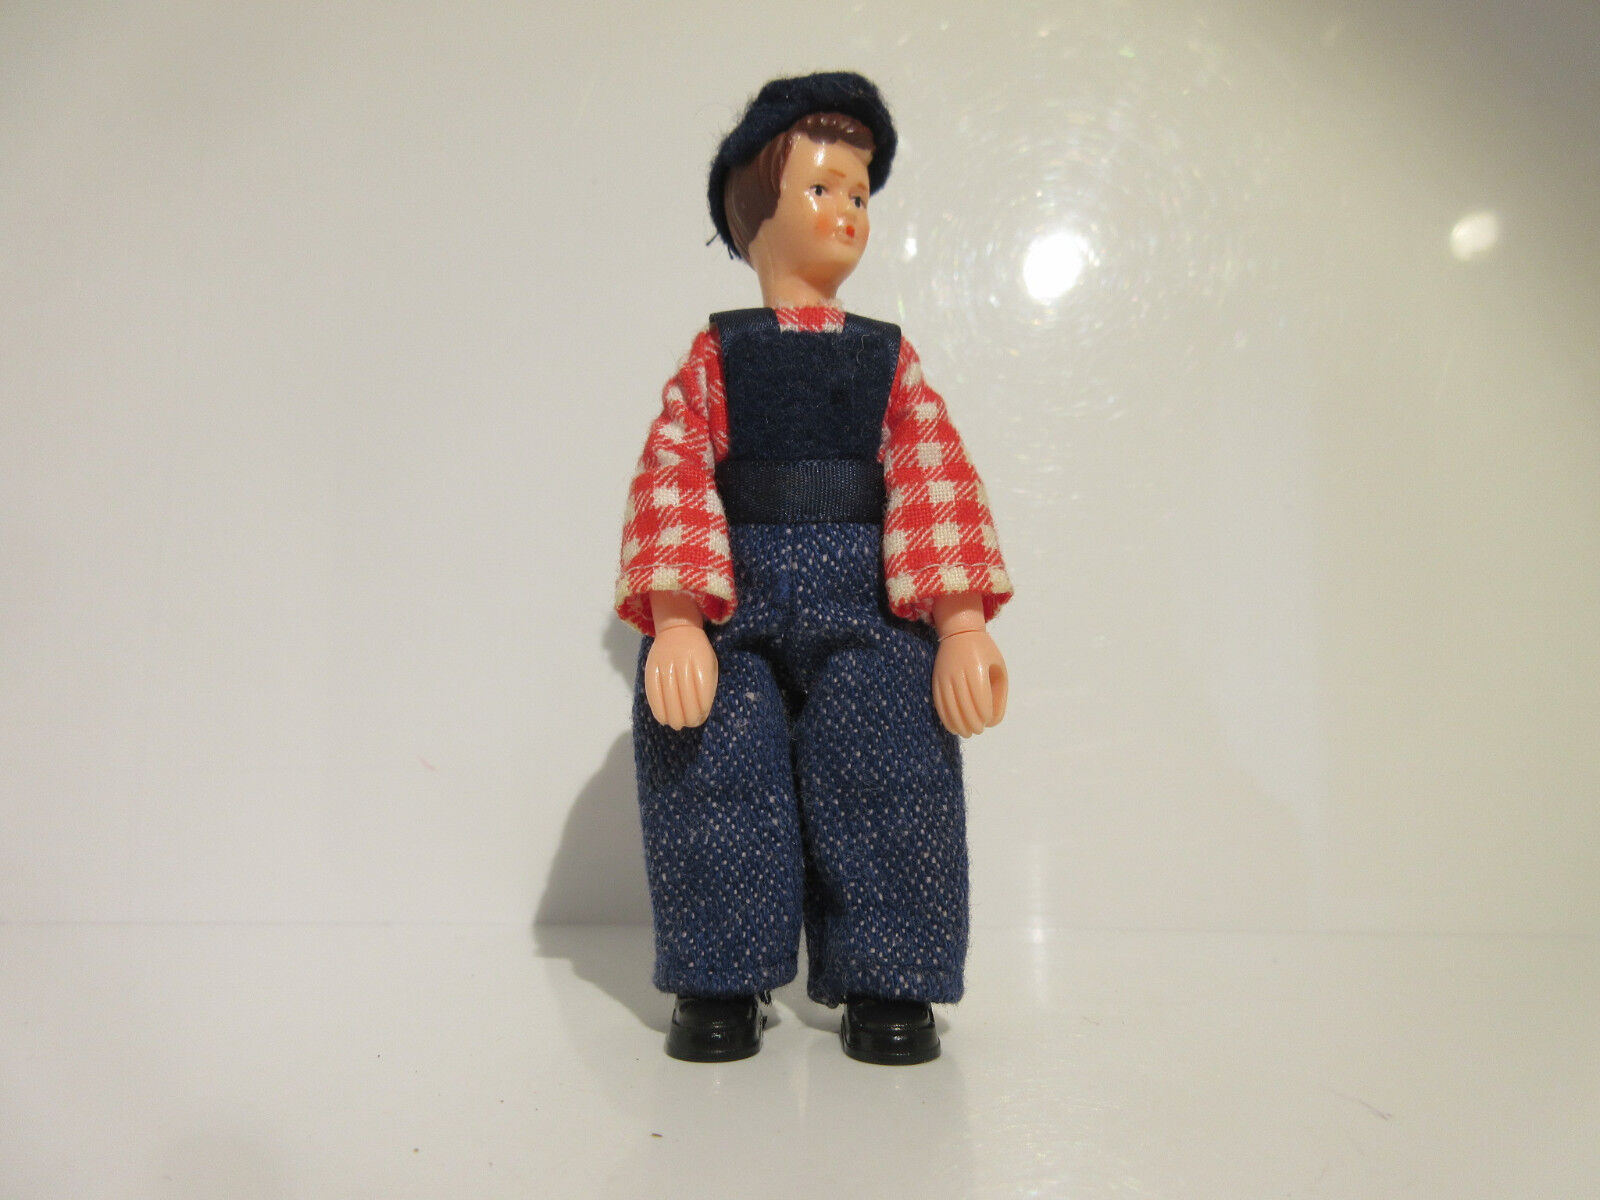 13412 Schleich Farmer   Red shirt  VERY RARE ref 1D1456